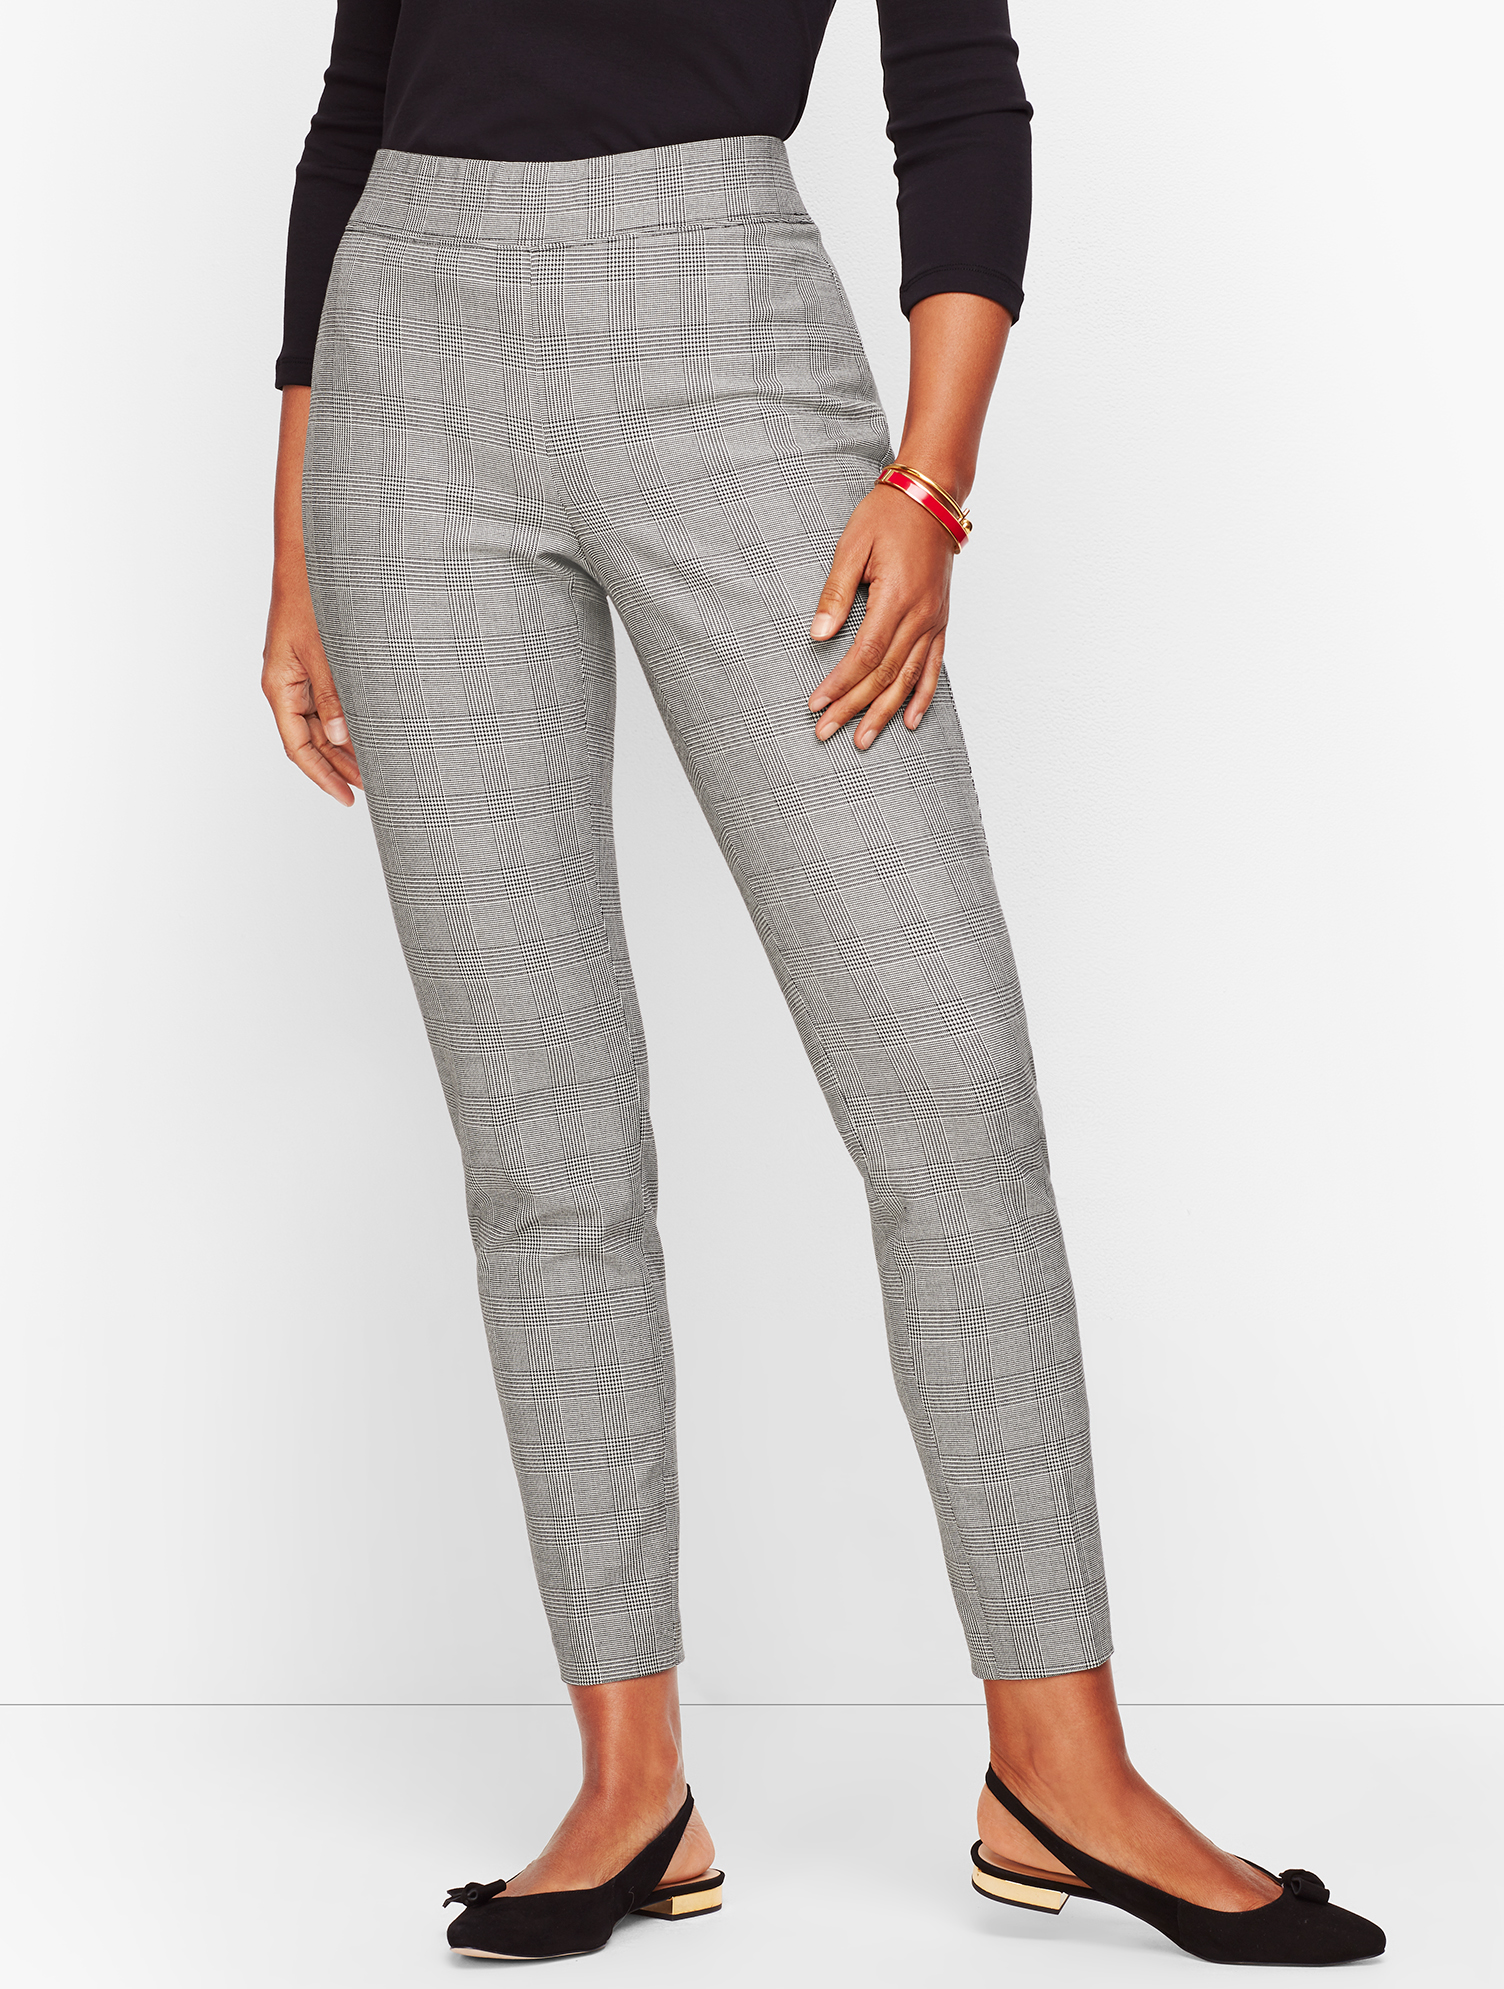 Vintage High Waisted Trousers, Sailor Pants, Jeans Talbots Essex Ankle Pants - Curvy Fit - Glen Plaid - IvoryBlack - 16 $44.99 AT vintagedancer.com